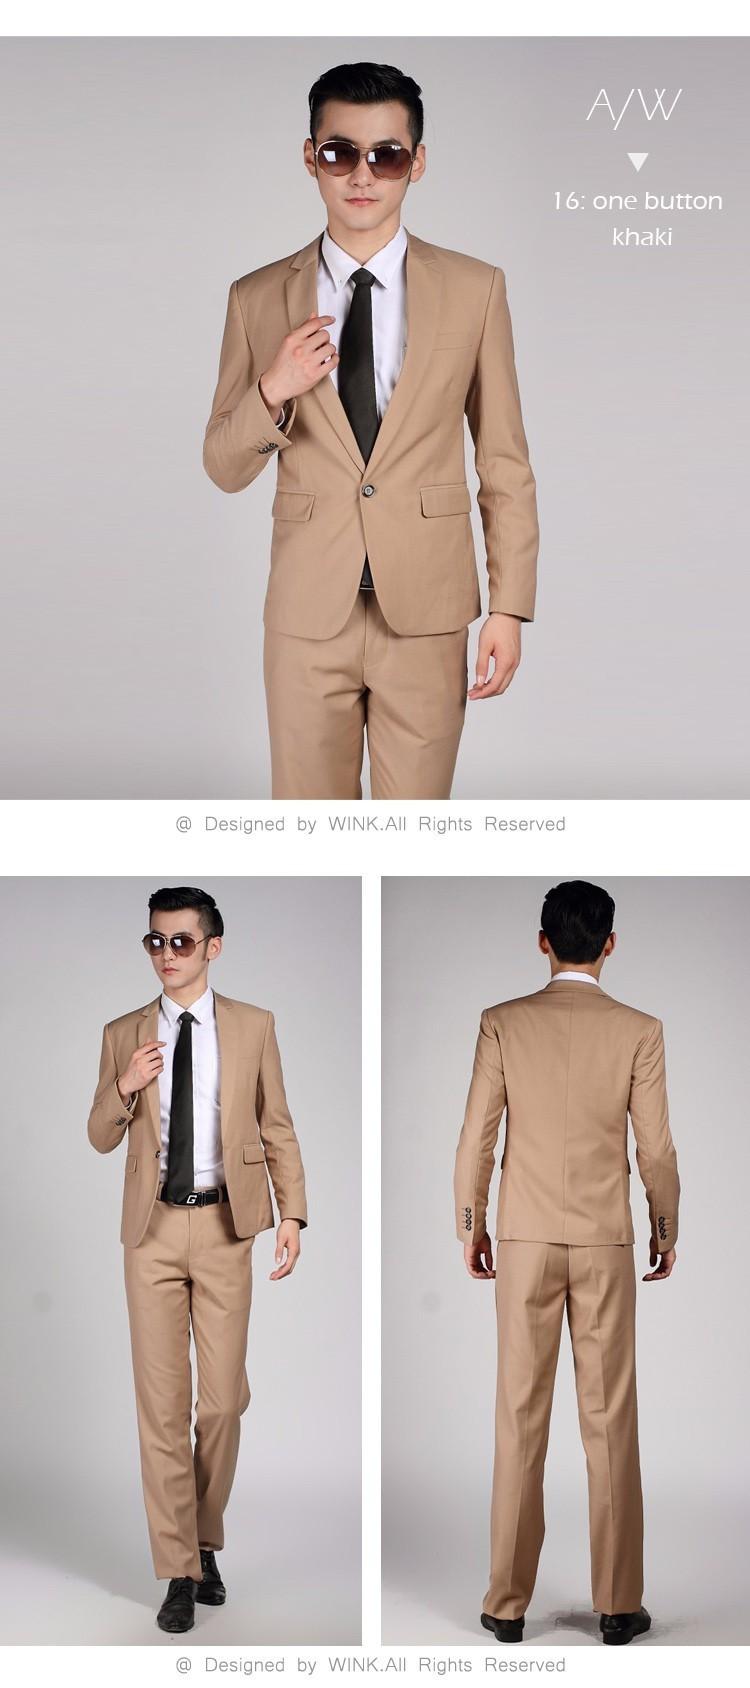 HTB1kp 2LVXXXXaJXFXXq6xXFXXXS - (Jacket+Pant+Tie) Men Wedding Suit Sets Tuxedo Formal Fashion Slim Fit Business Dress Suits Blazer Brand Party Masculino Suits